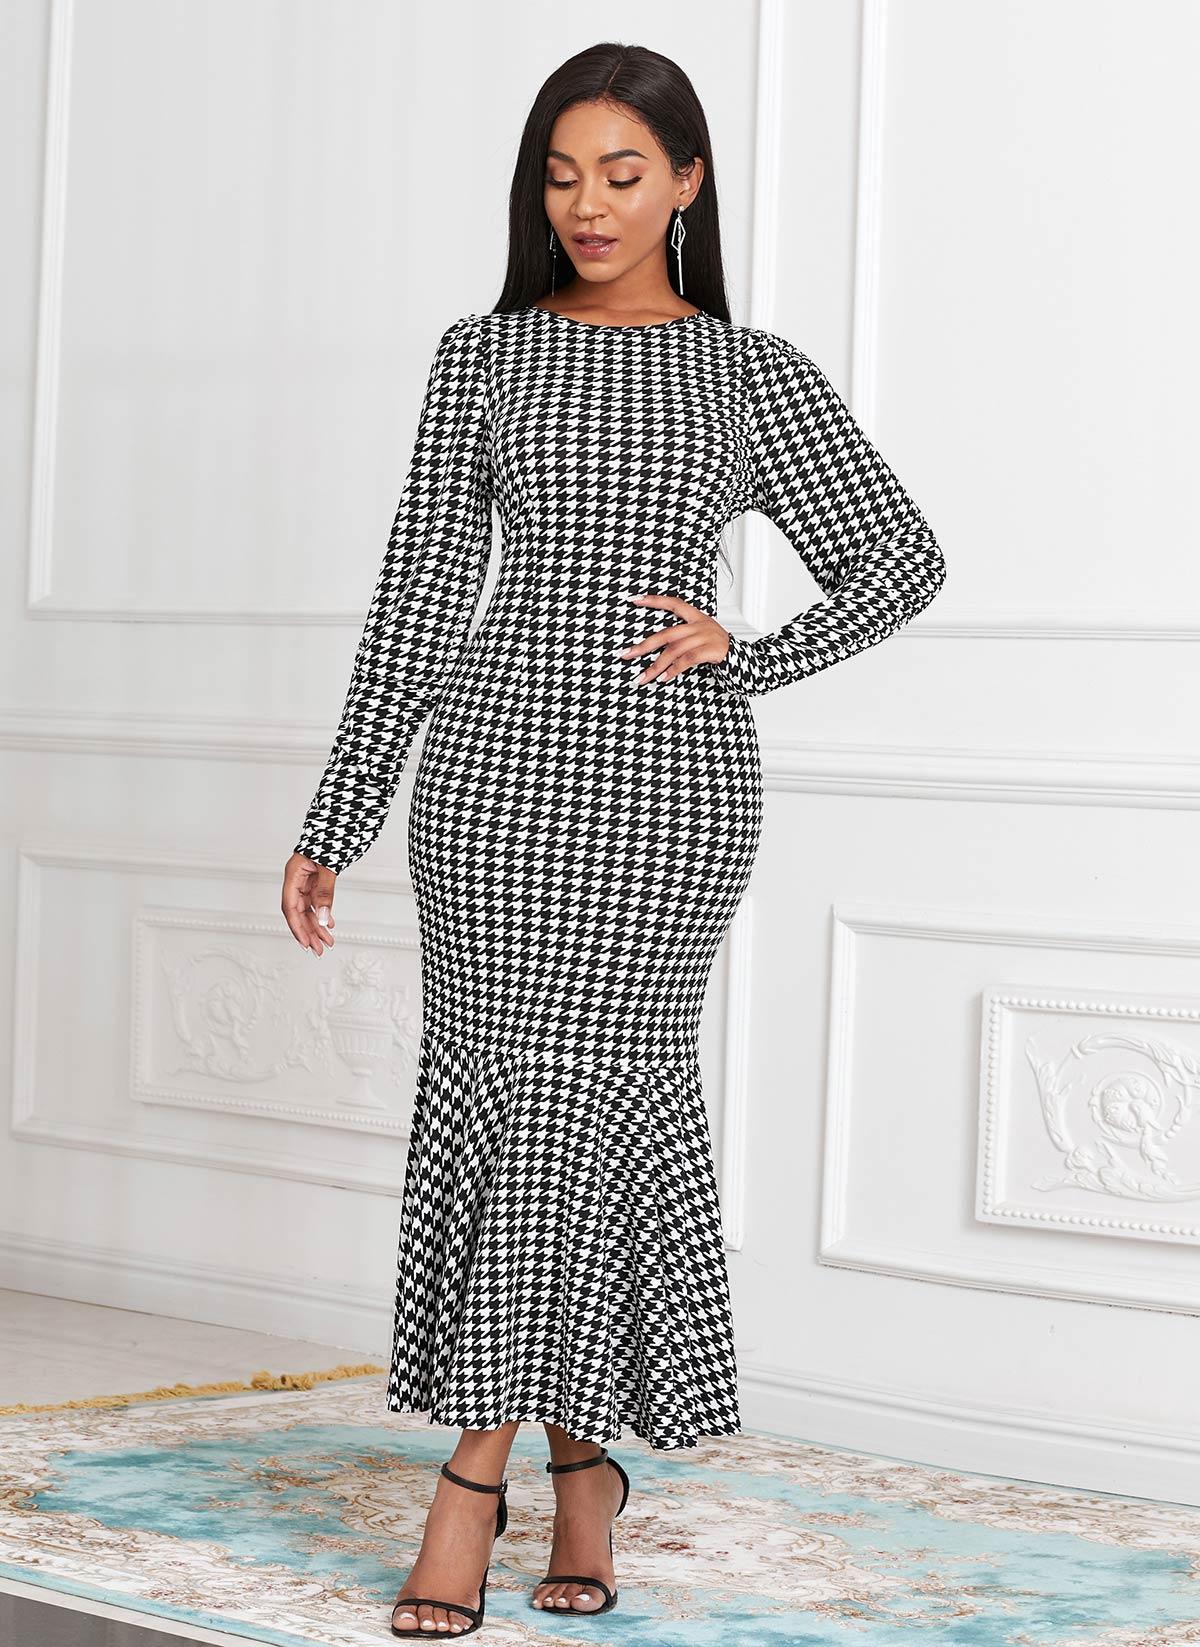 Houndstooth Print Long Sleeve Round Neck Mermaid Dress